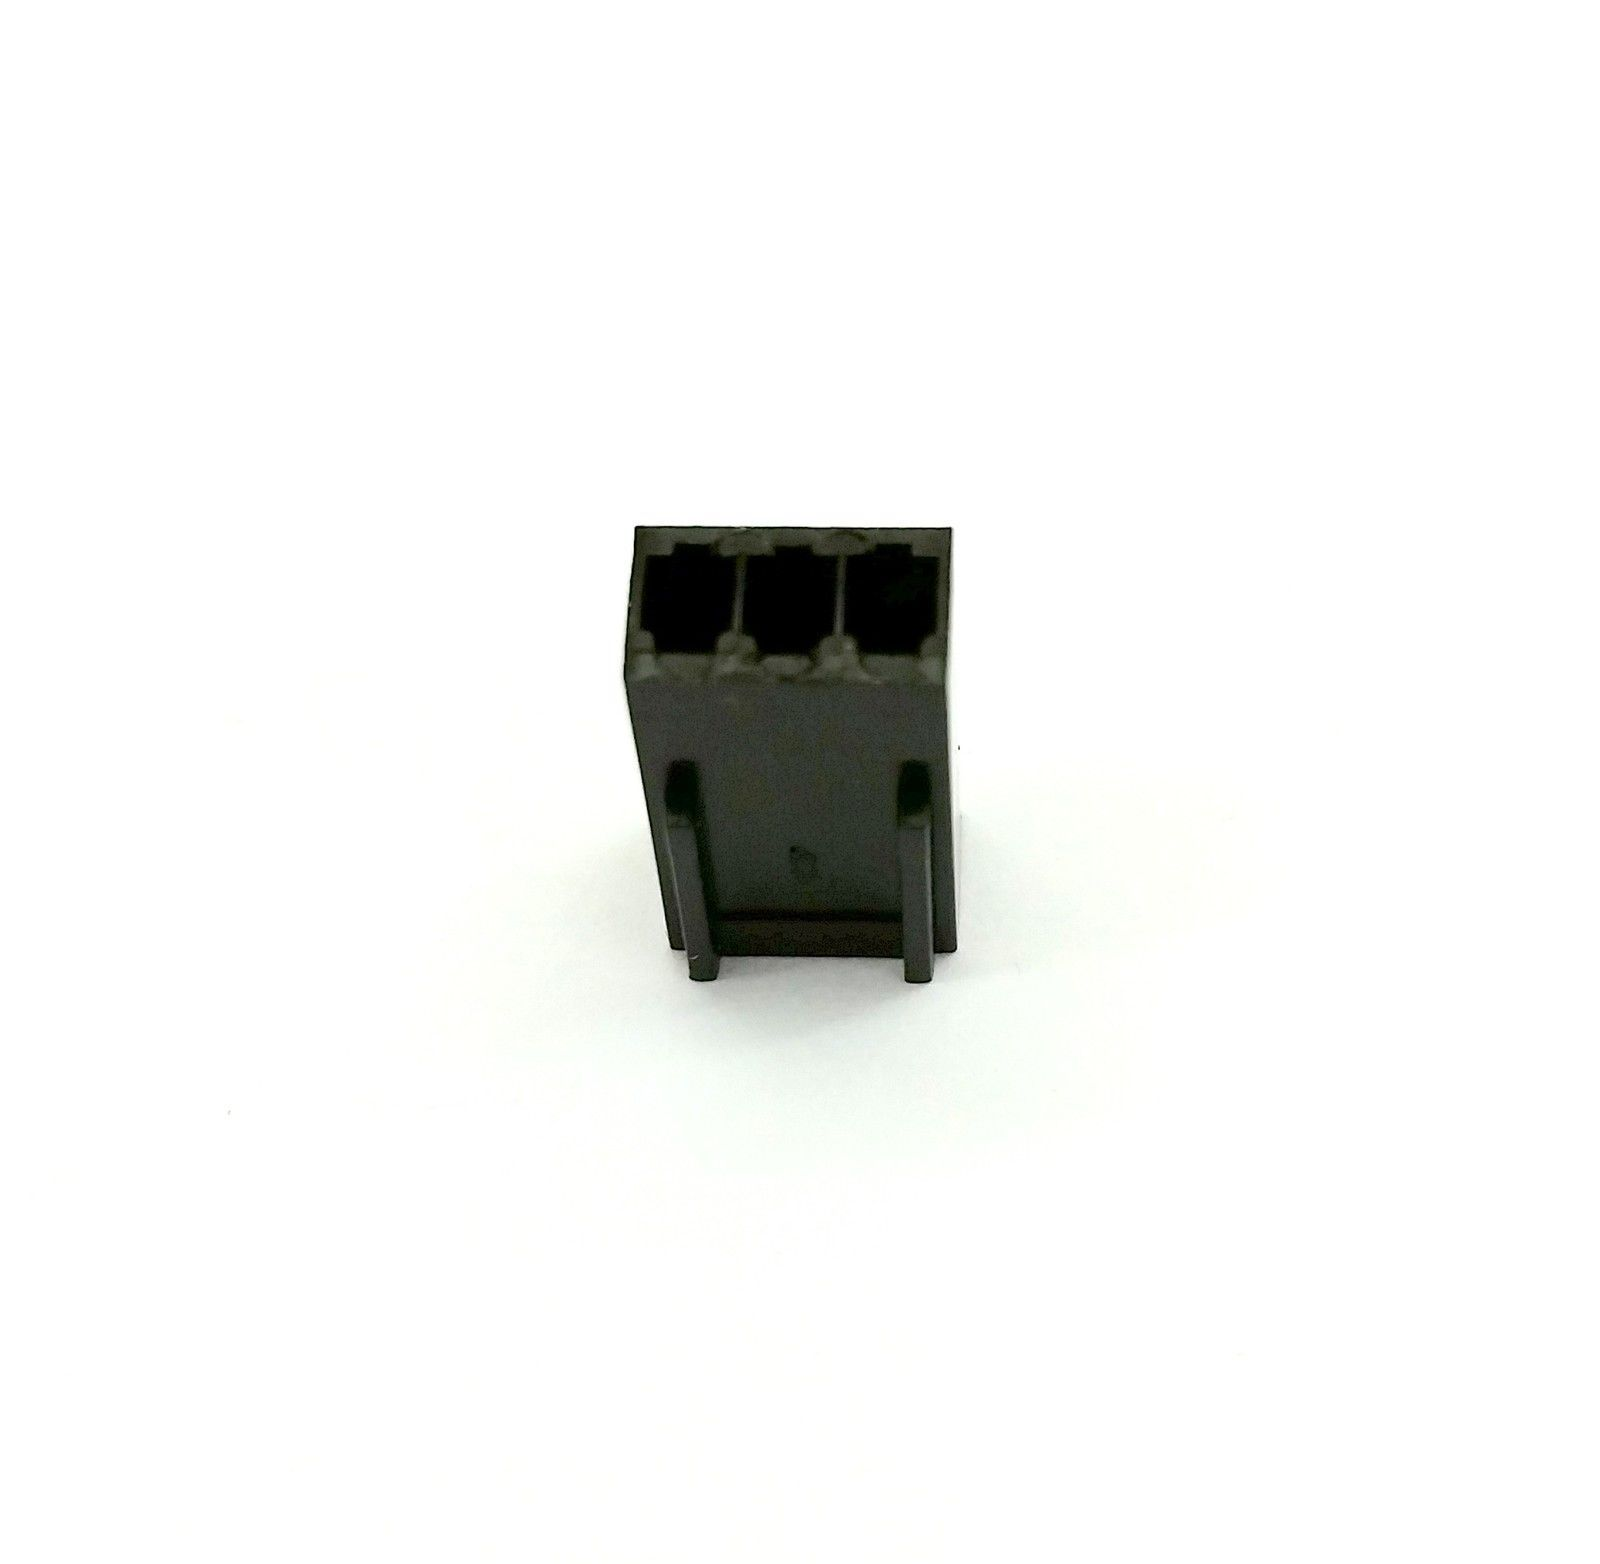 PK OF 2 - FEMALE 3 PIN FAN POWER CONNECTOR - BLACK INC PINS